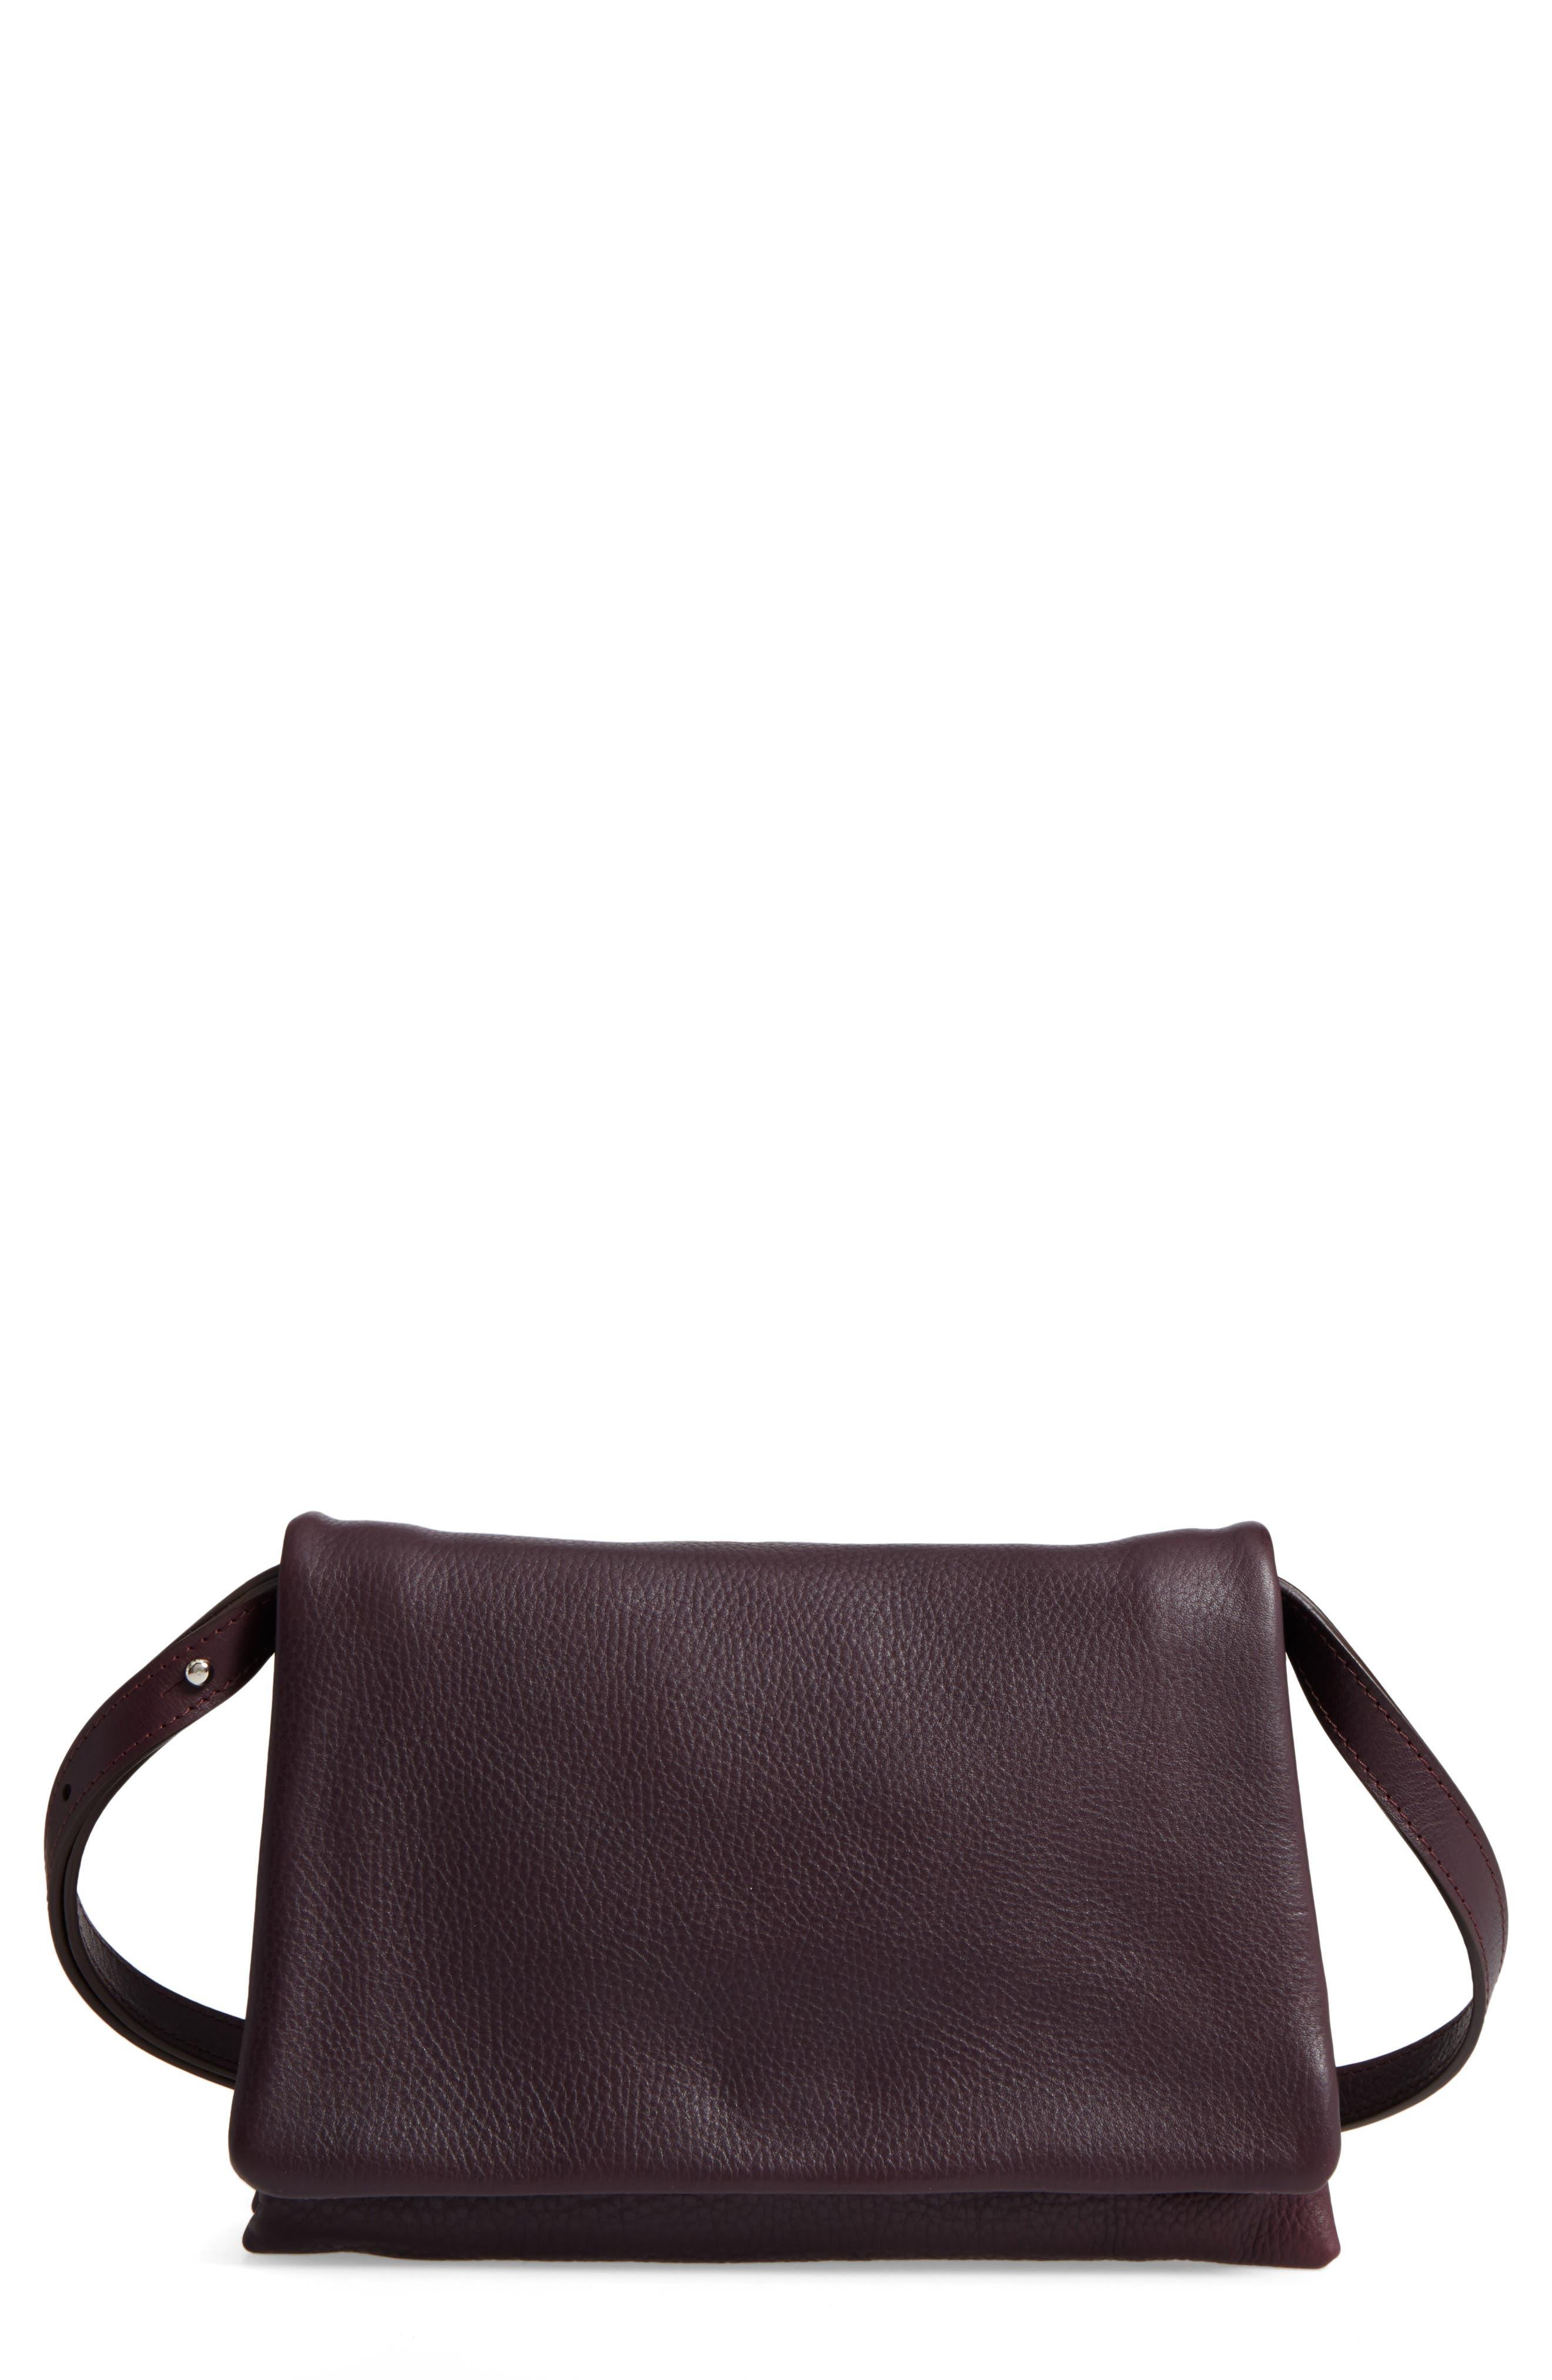 Main Image - Shinola Leather Convertible Shoulder Bag